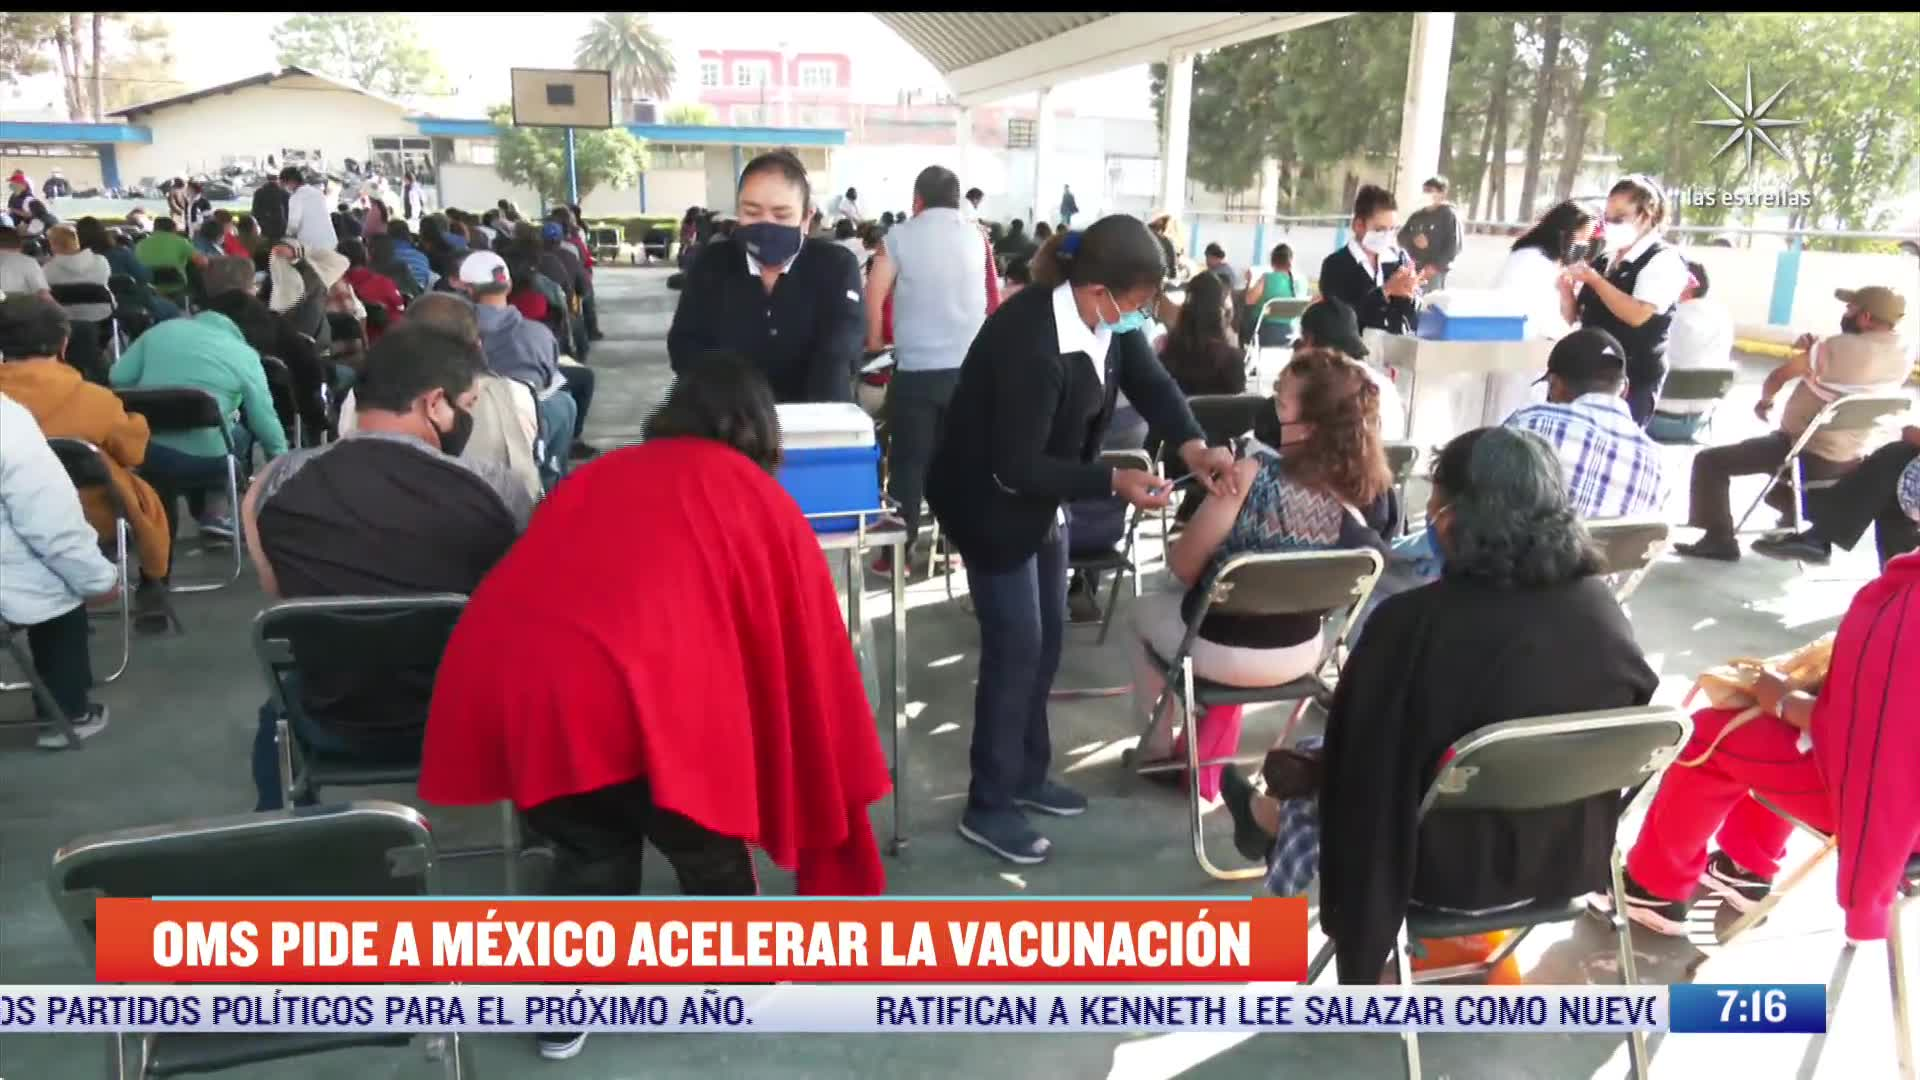 OMS pide a México acelerar vacunación contra COVID-19